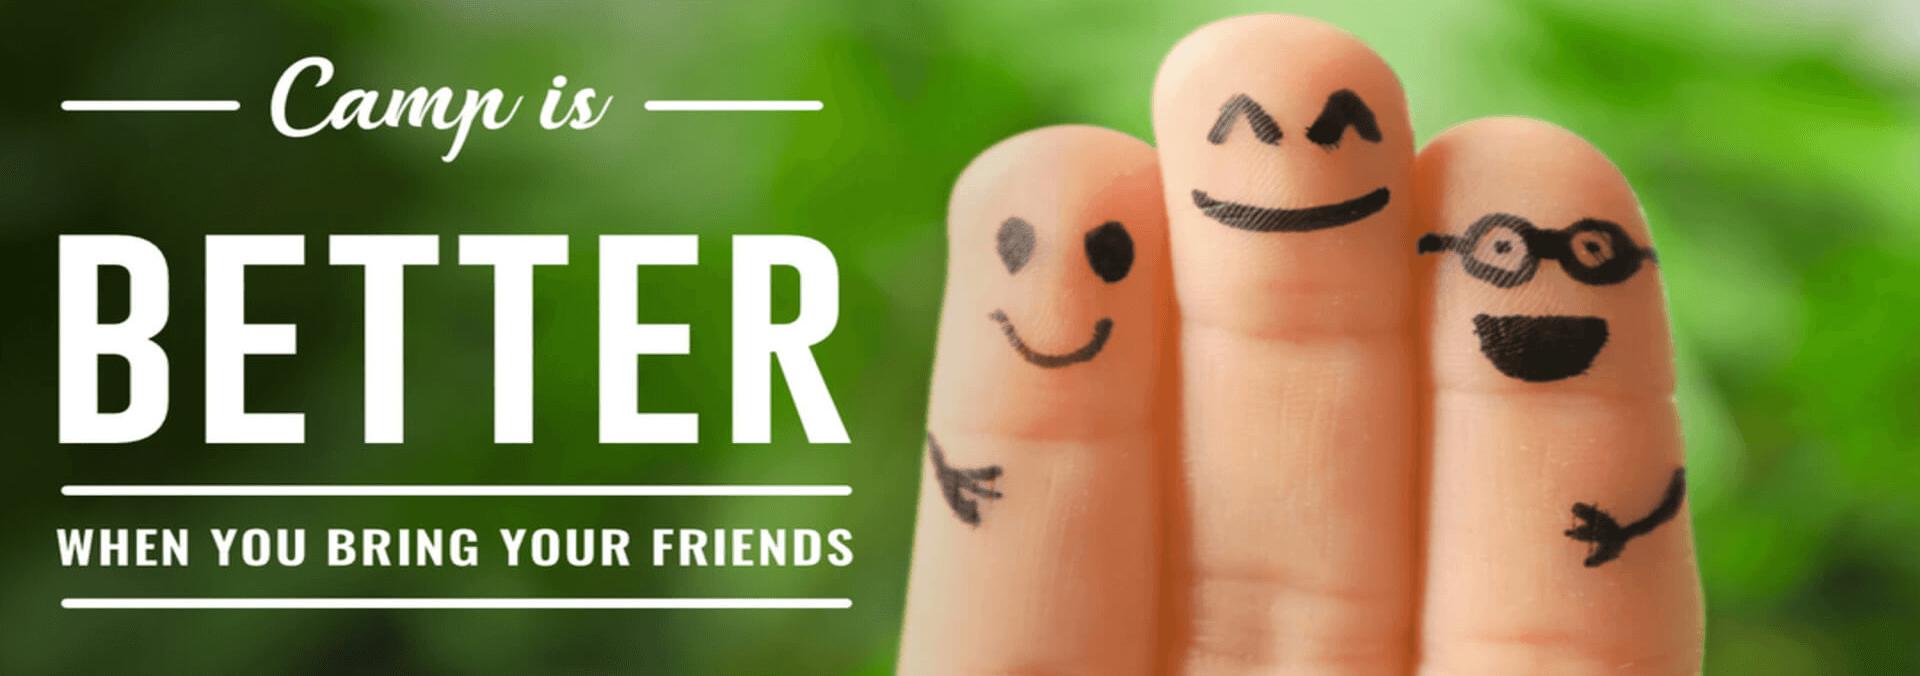 invite friend banner